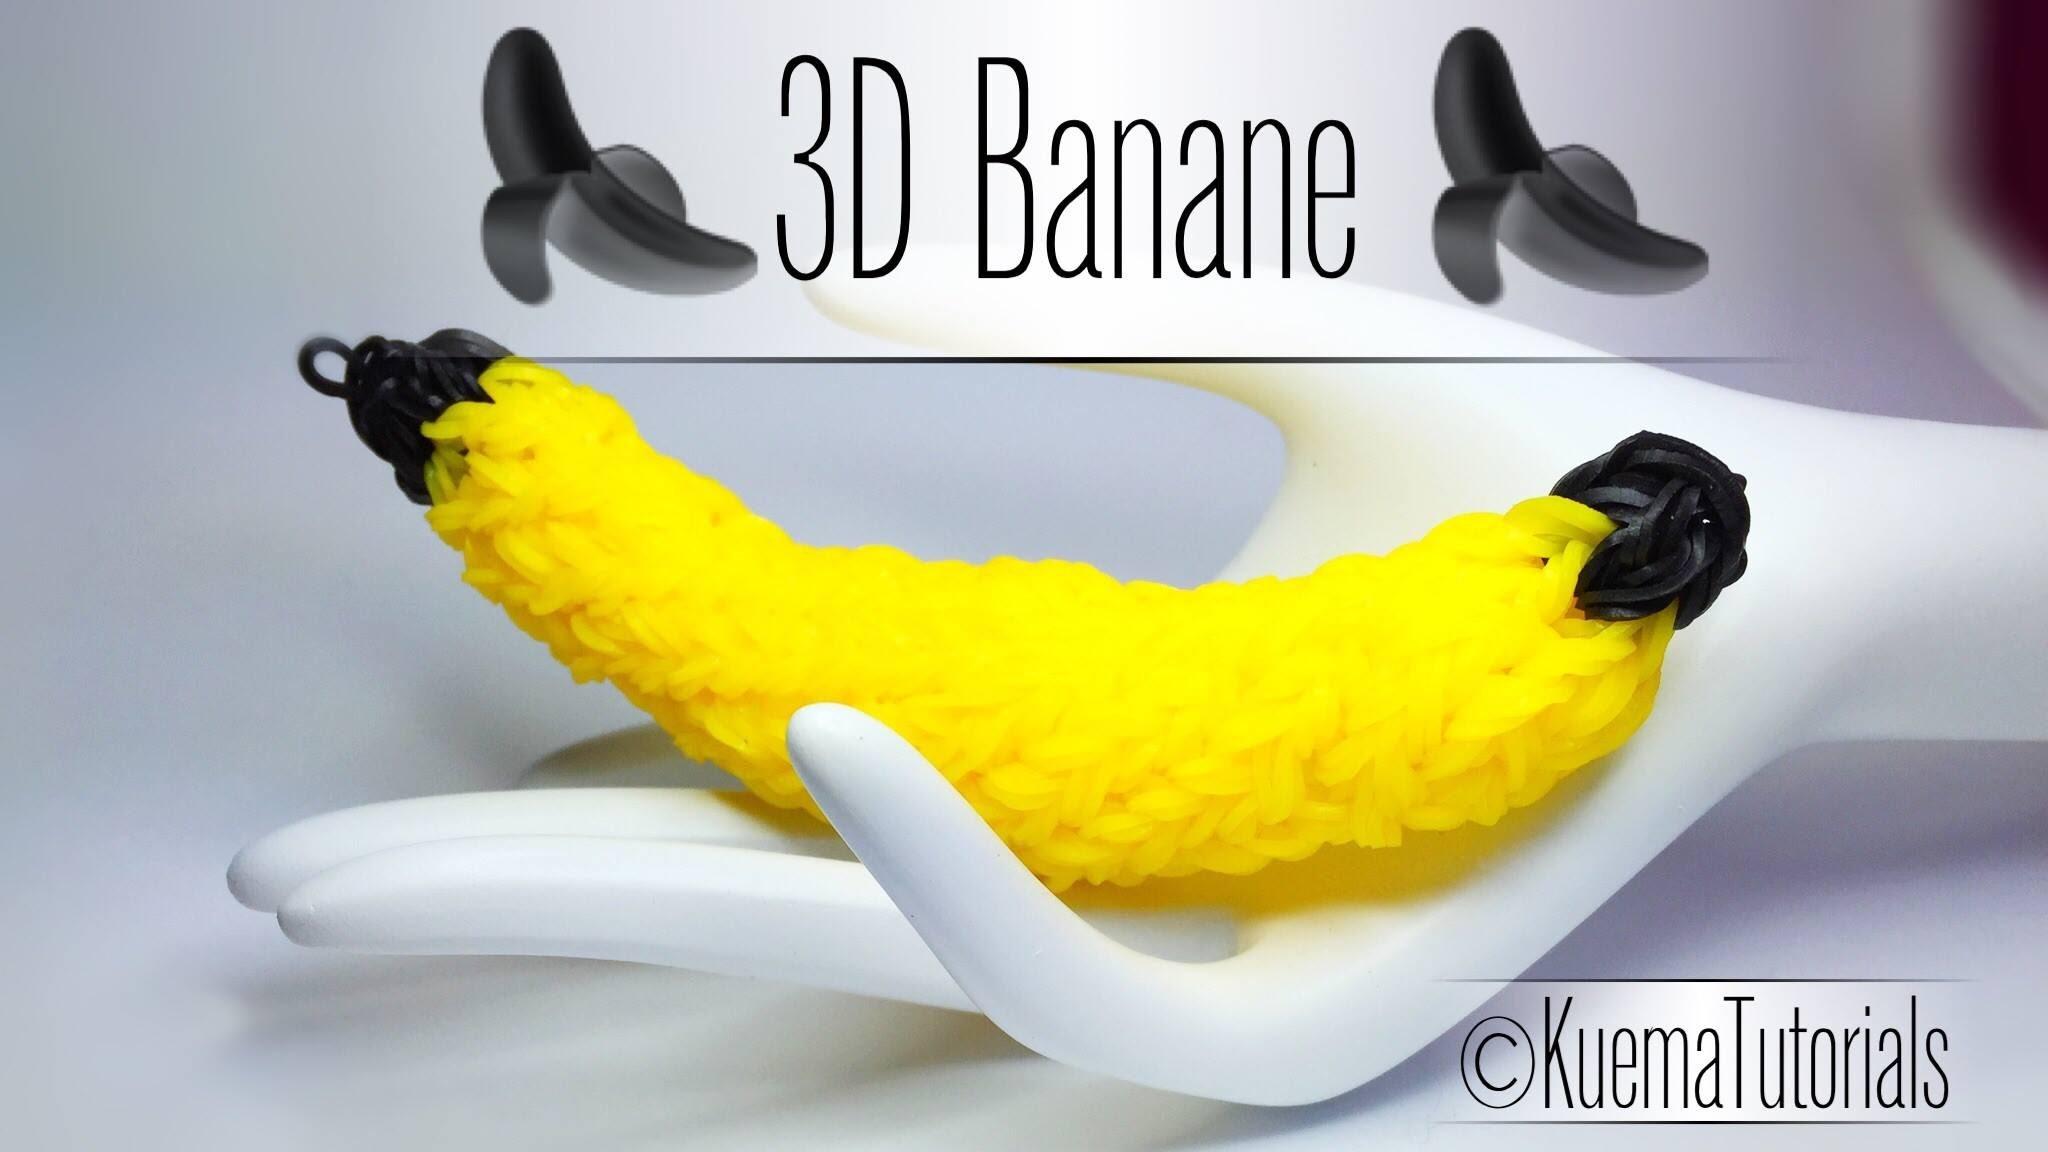 Rainbow Loom - 3D Banane. 3D Banana